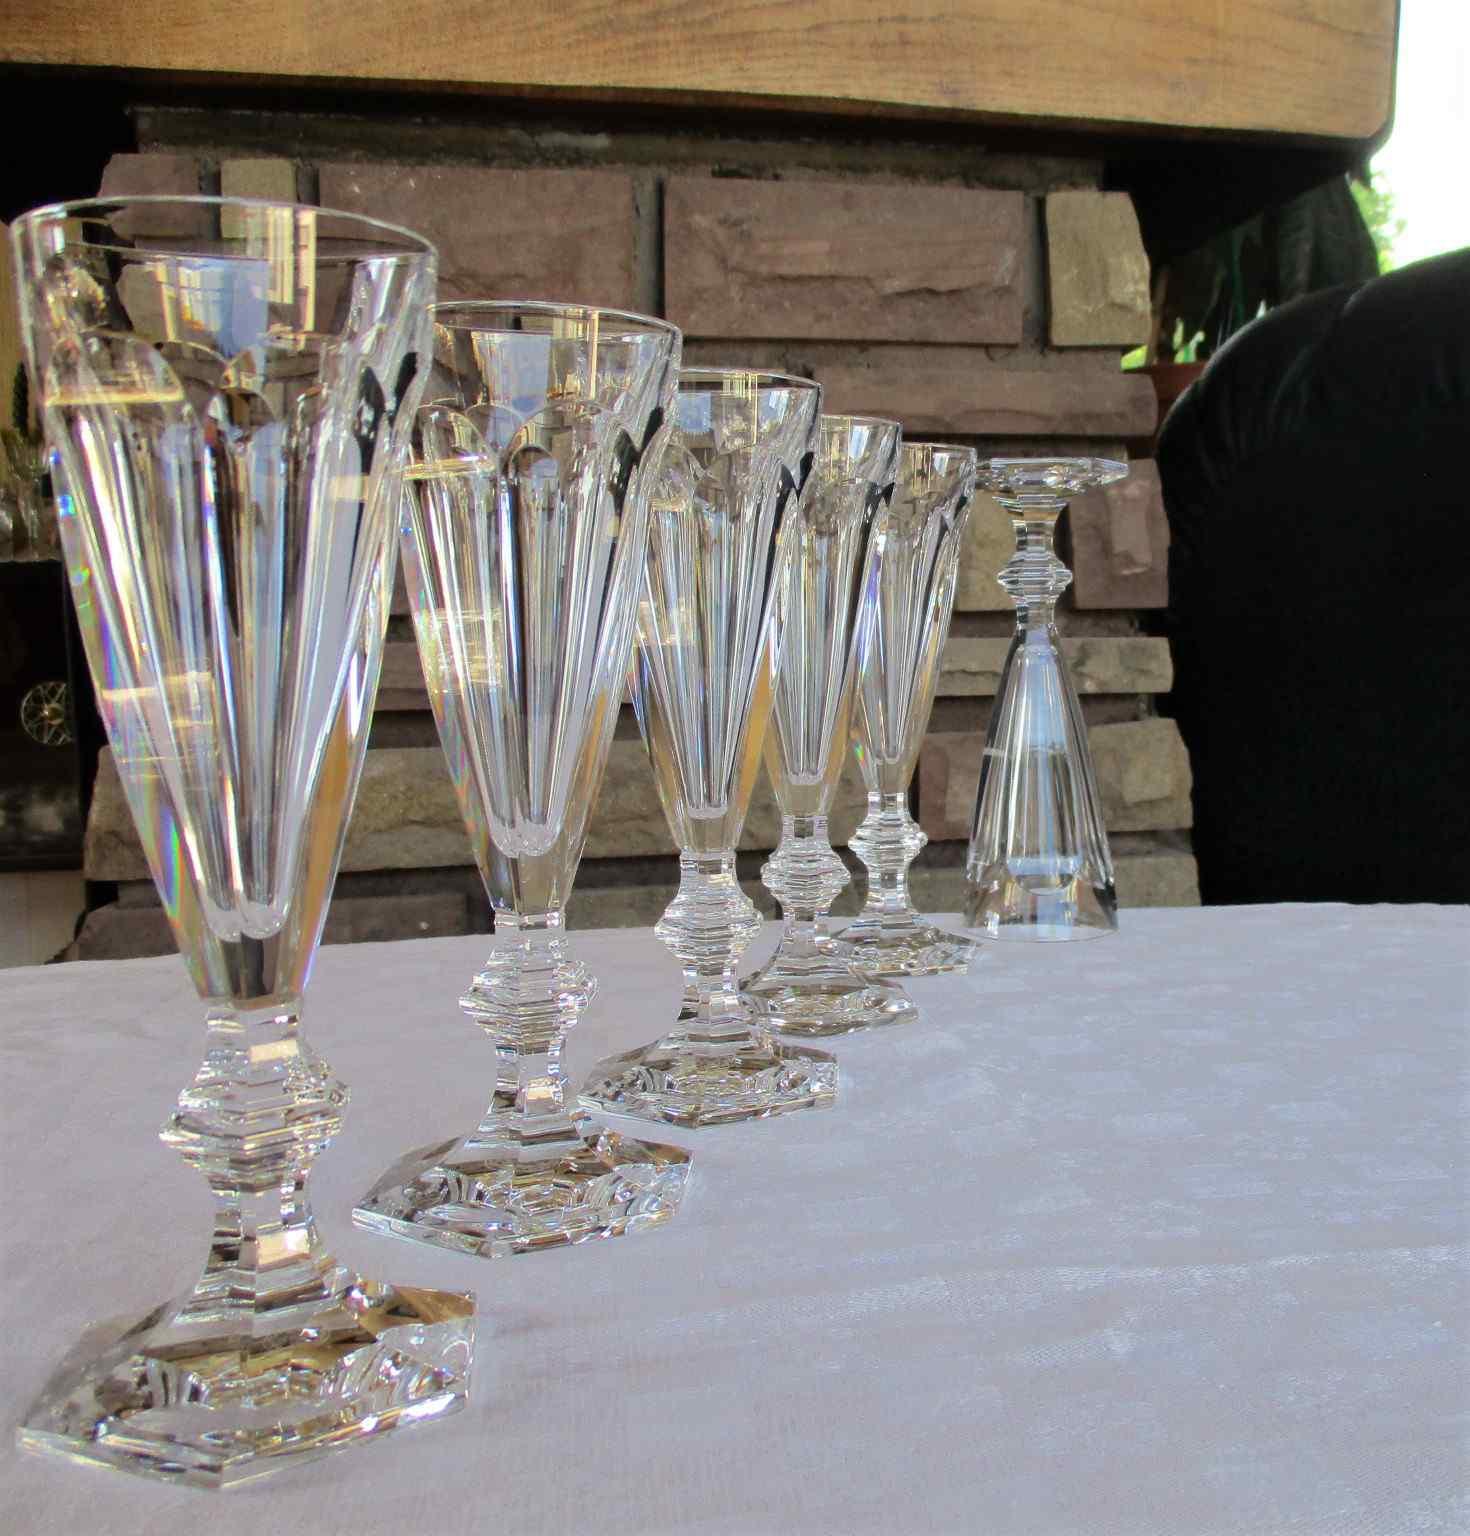 Service de verres Harcourt en cristal de Baccarat